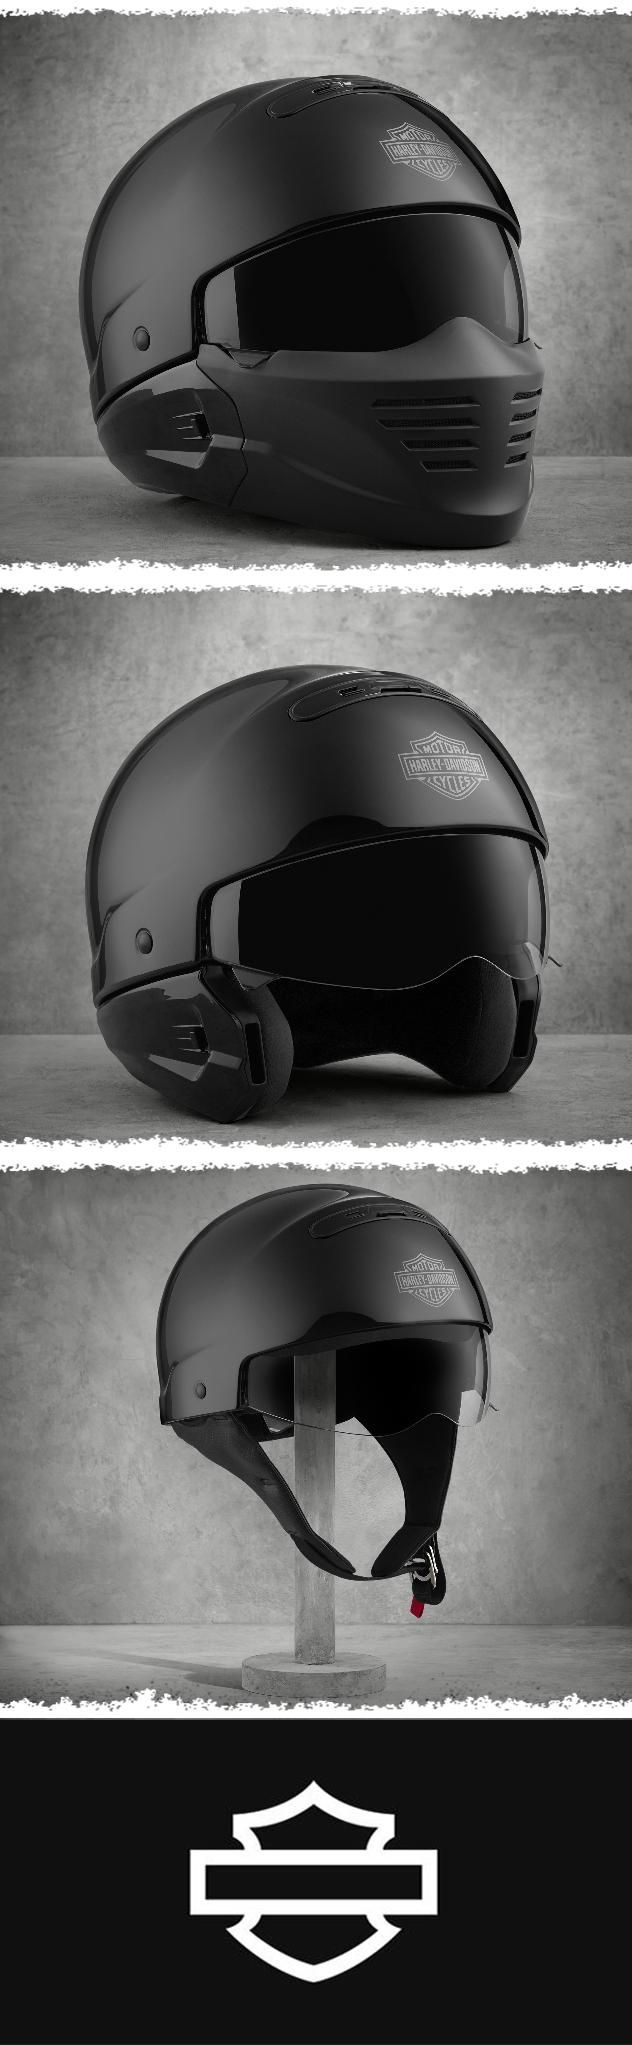 Pilot Style Motorcycle Helmet : pilot, style, motorcycle, helmet, Three, Innovative, Options, Added, Comfort., Harley-Davidson, Pilot, 3-in-1, Helmet, Harley, Davidson, Helmets,, Helmet,, Custom, Motorcycle, Helmets